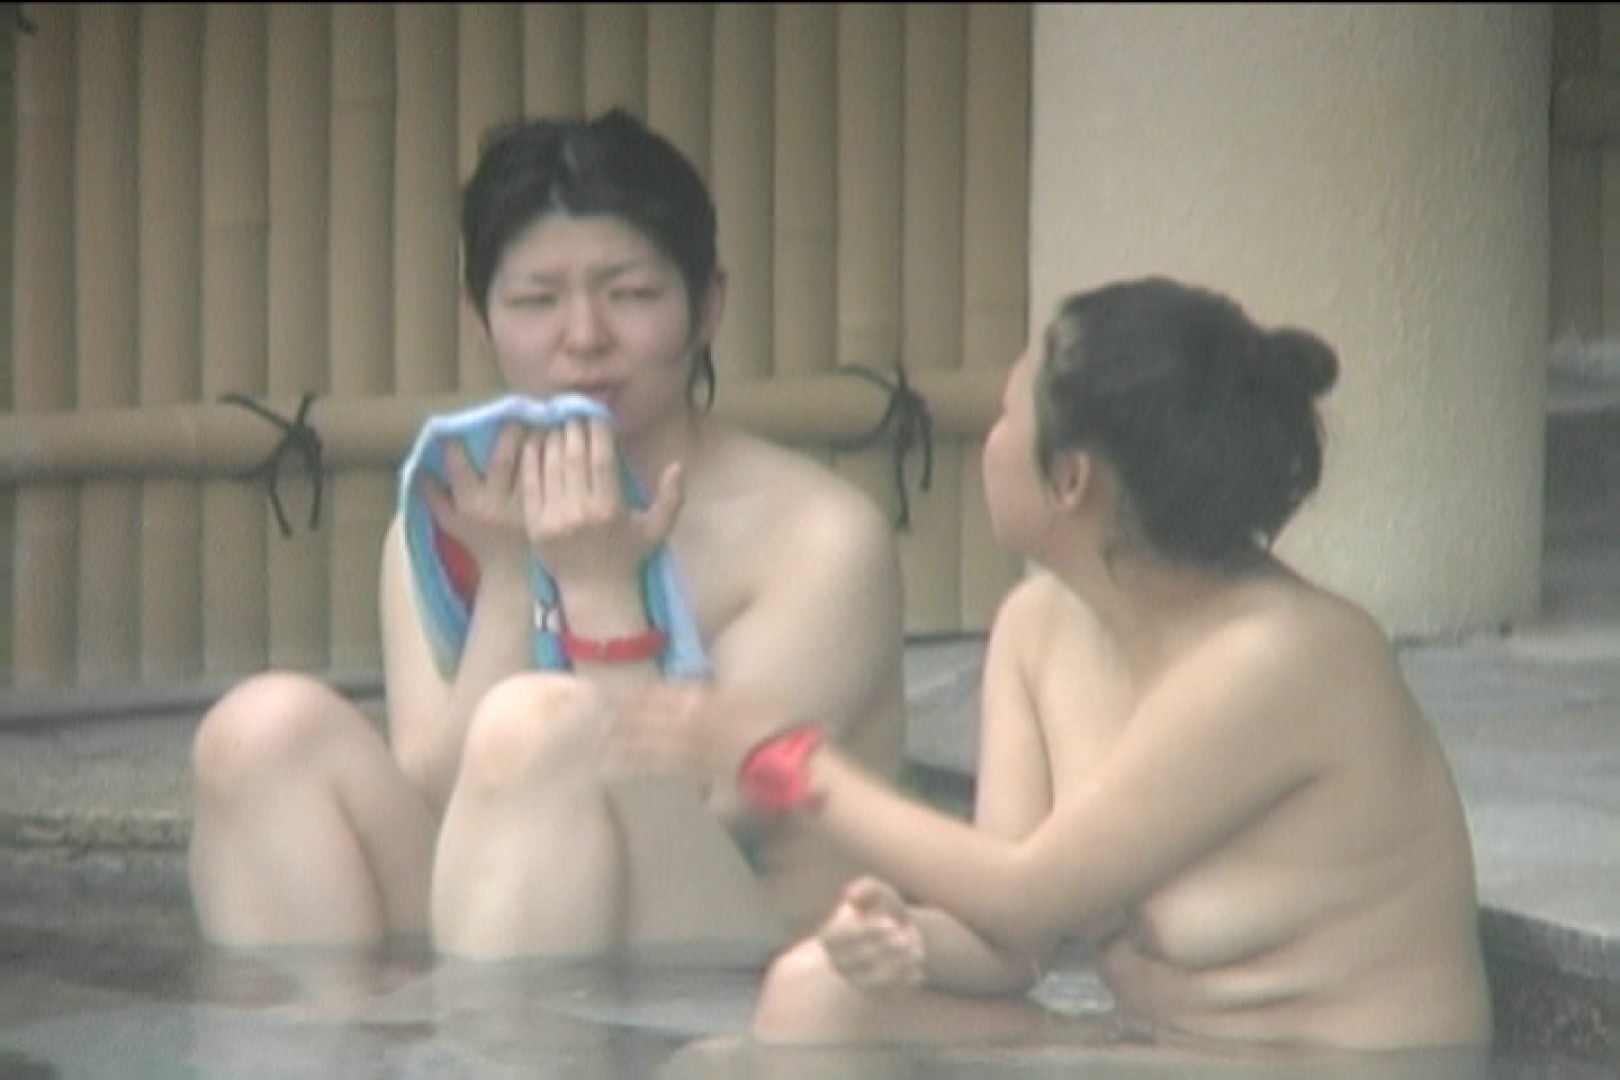 Aquaな露天風呂Vol.139 盗撮 | HなOL  53pic 7